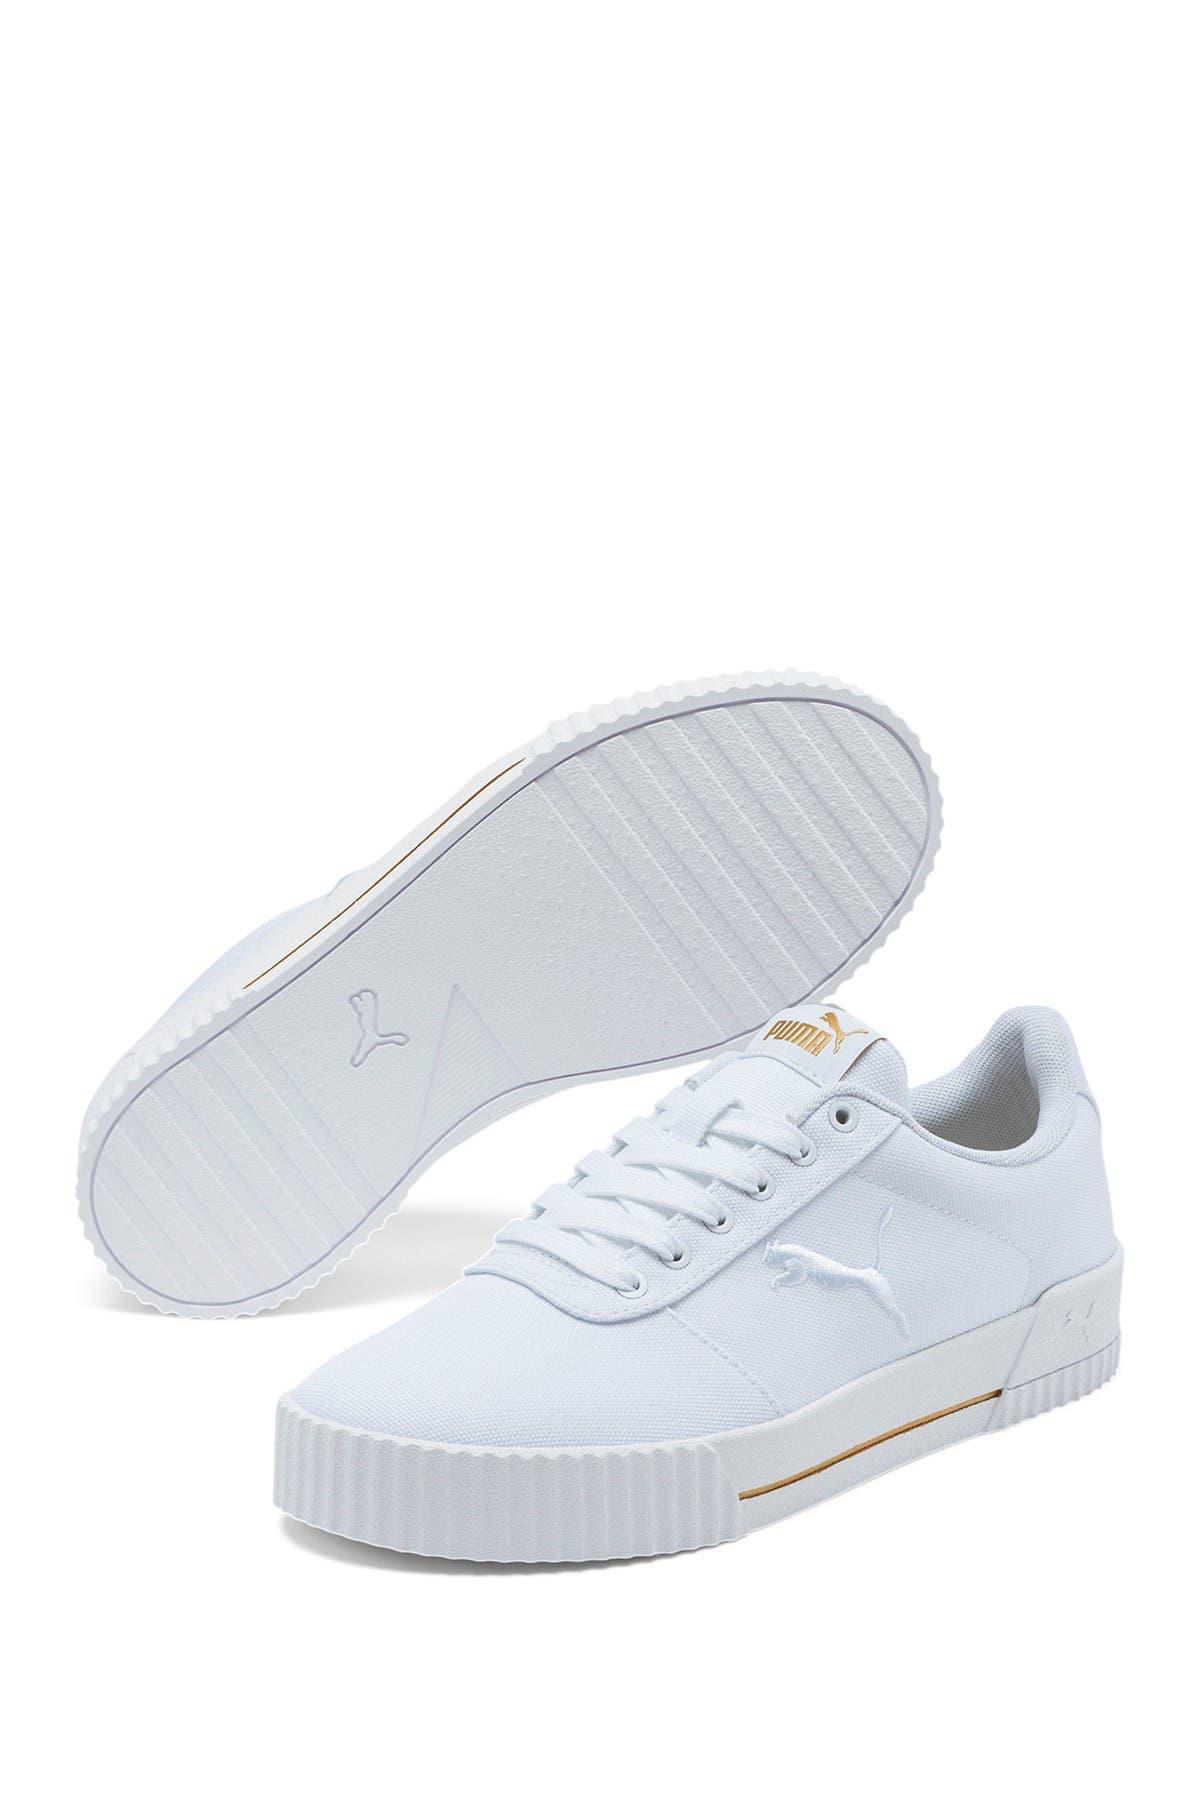 Image of PUMA Carina Summer Cat Low Top Sneaker